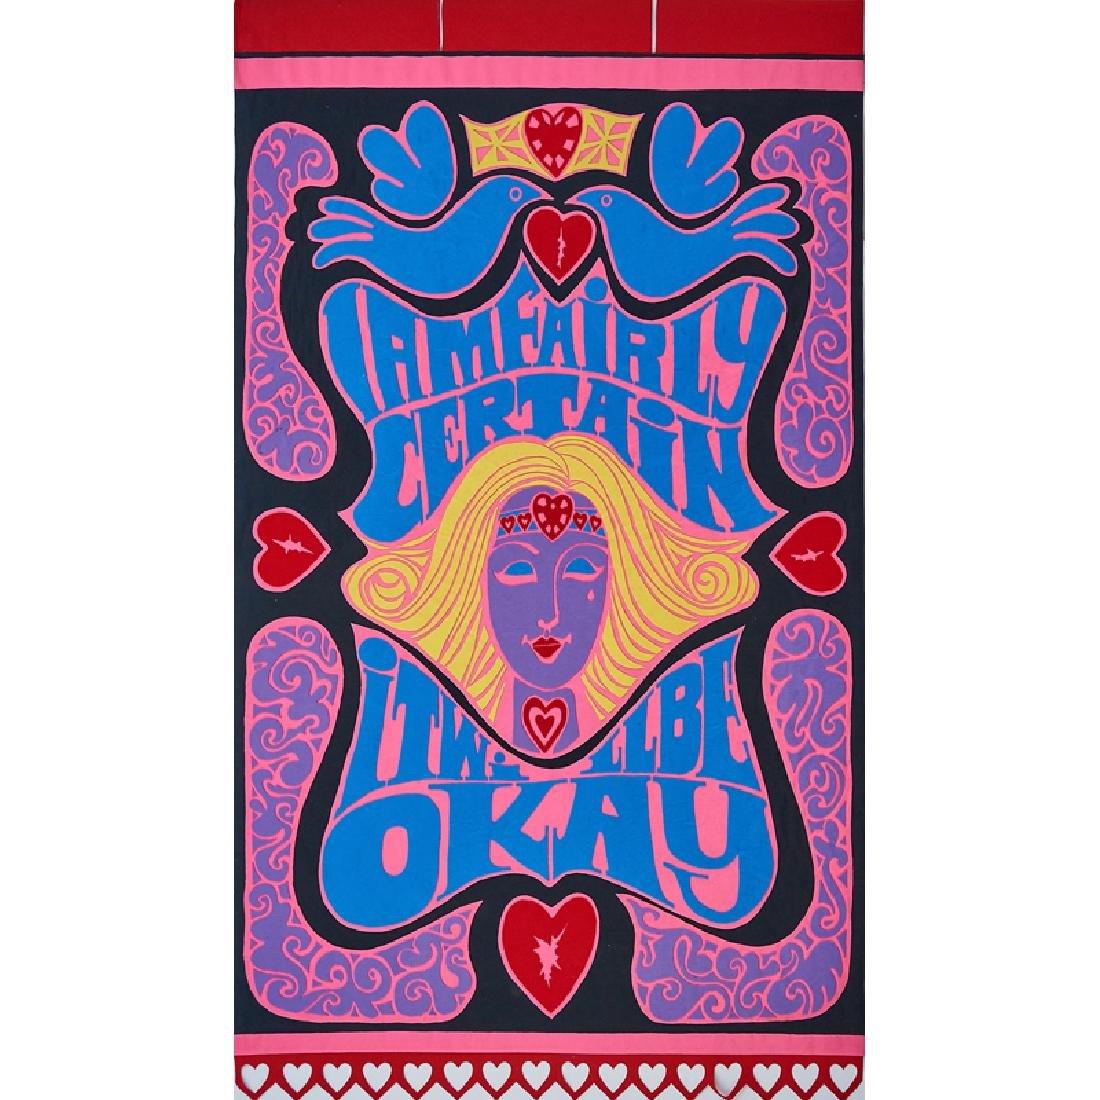 AMY GARTRELL (American, b. 1974)